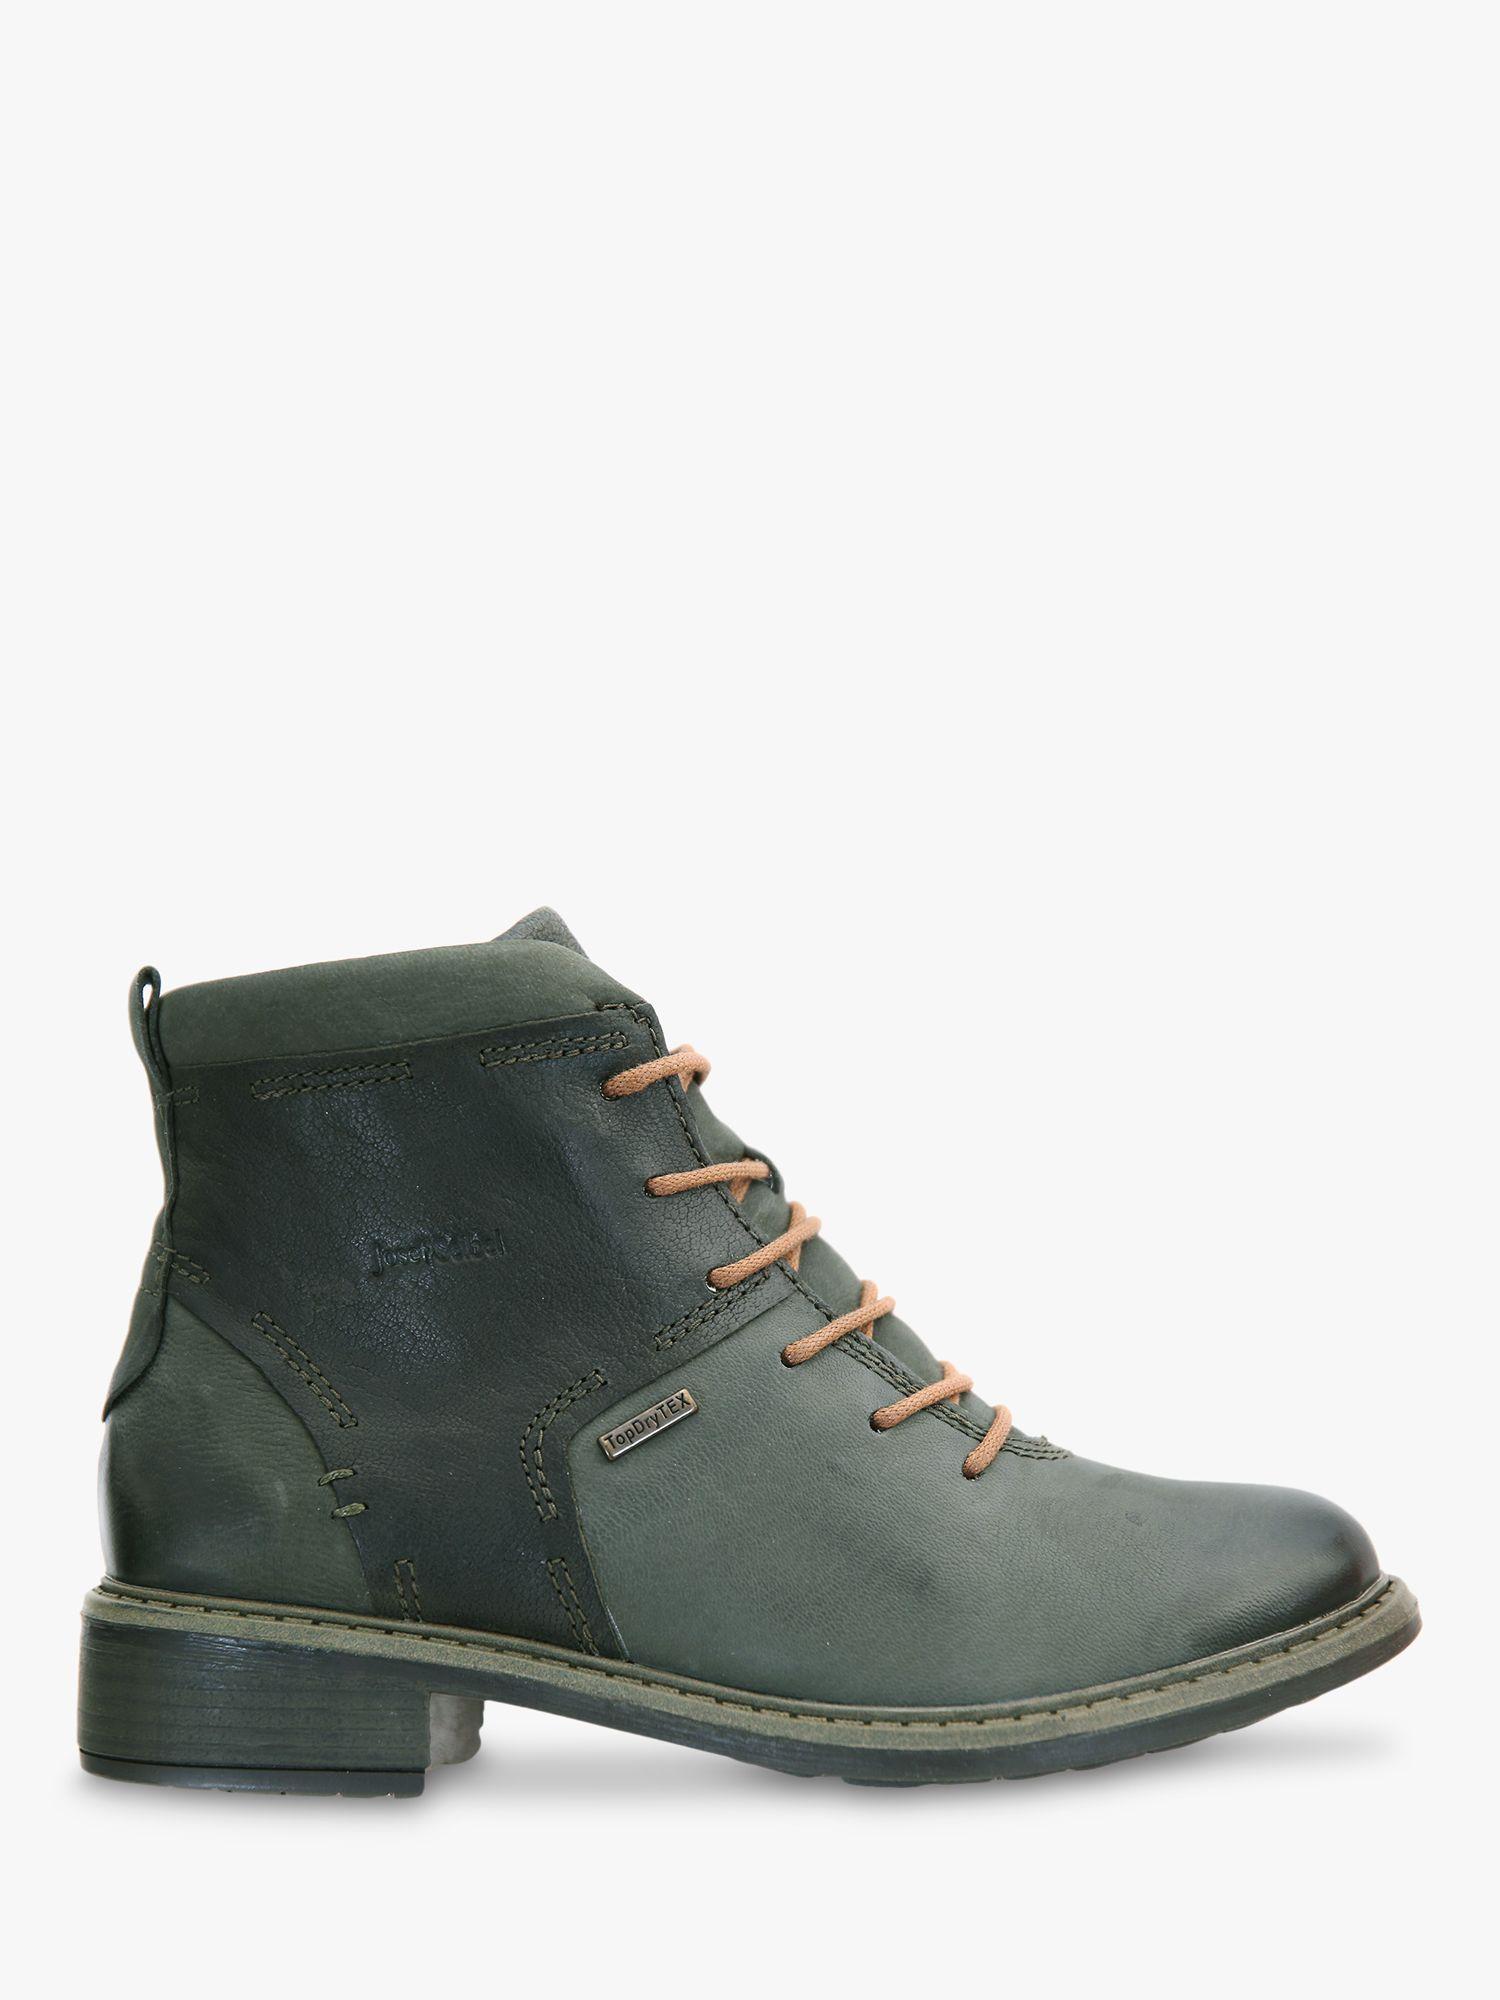 Josef Seibel Josef Seibel Selena 50 Waterproof Leather Ankle Boots, Tanne